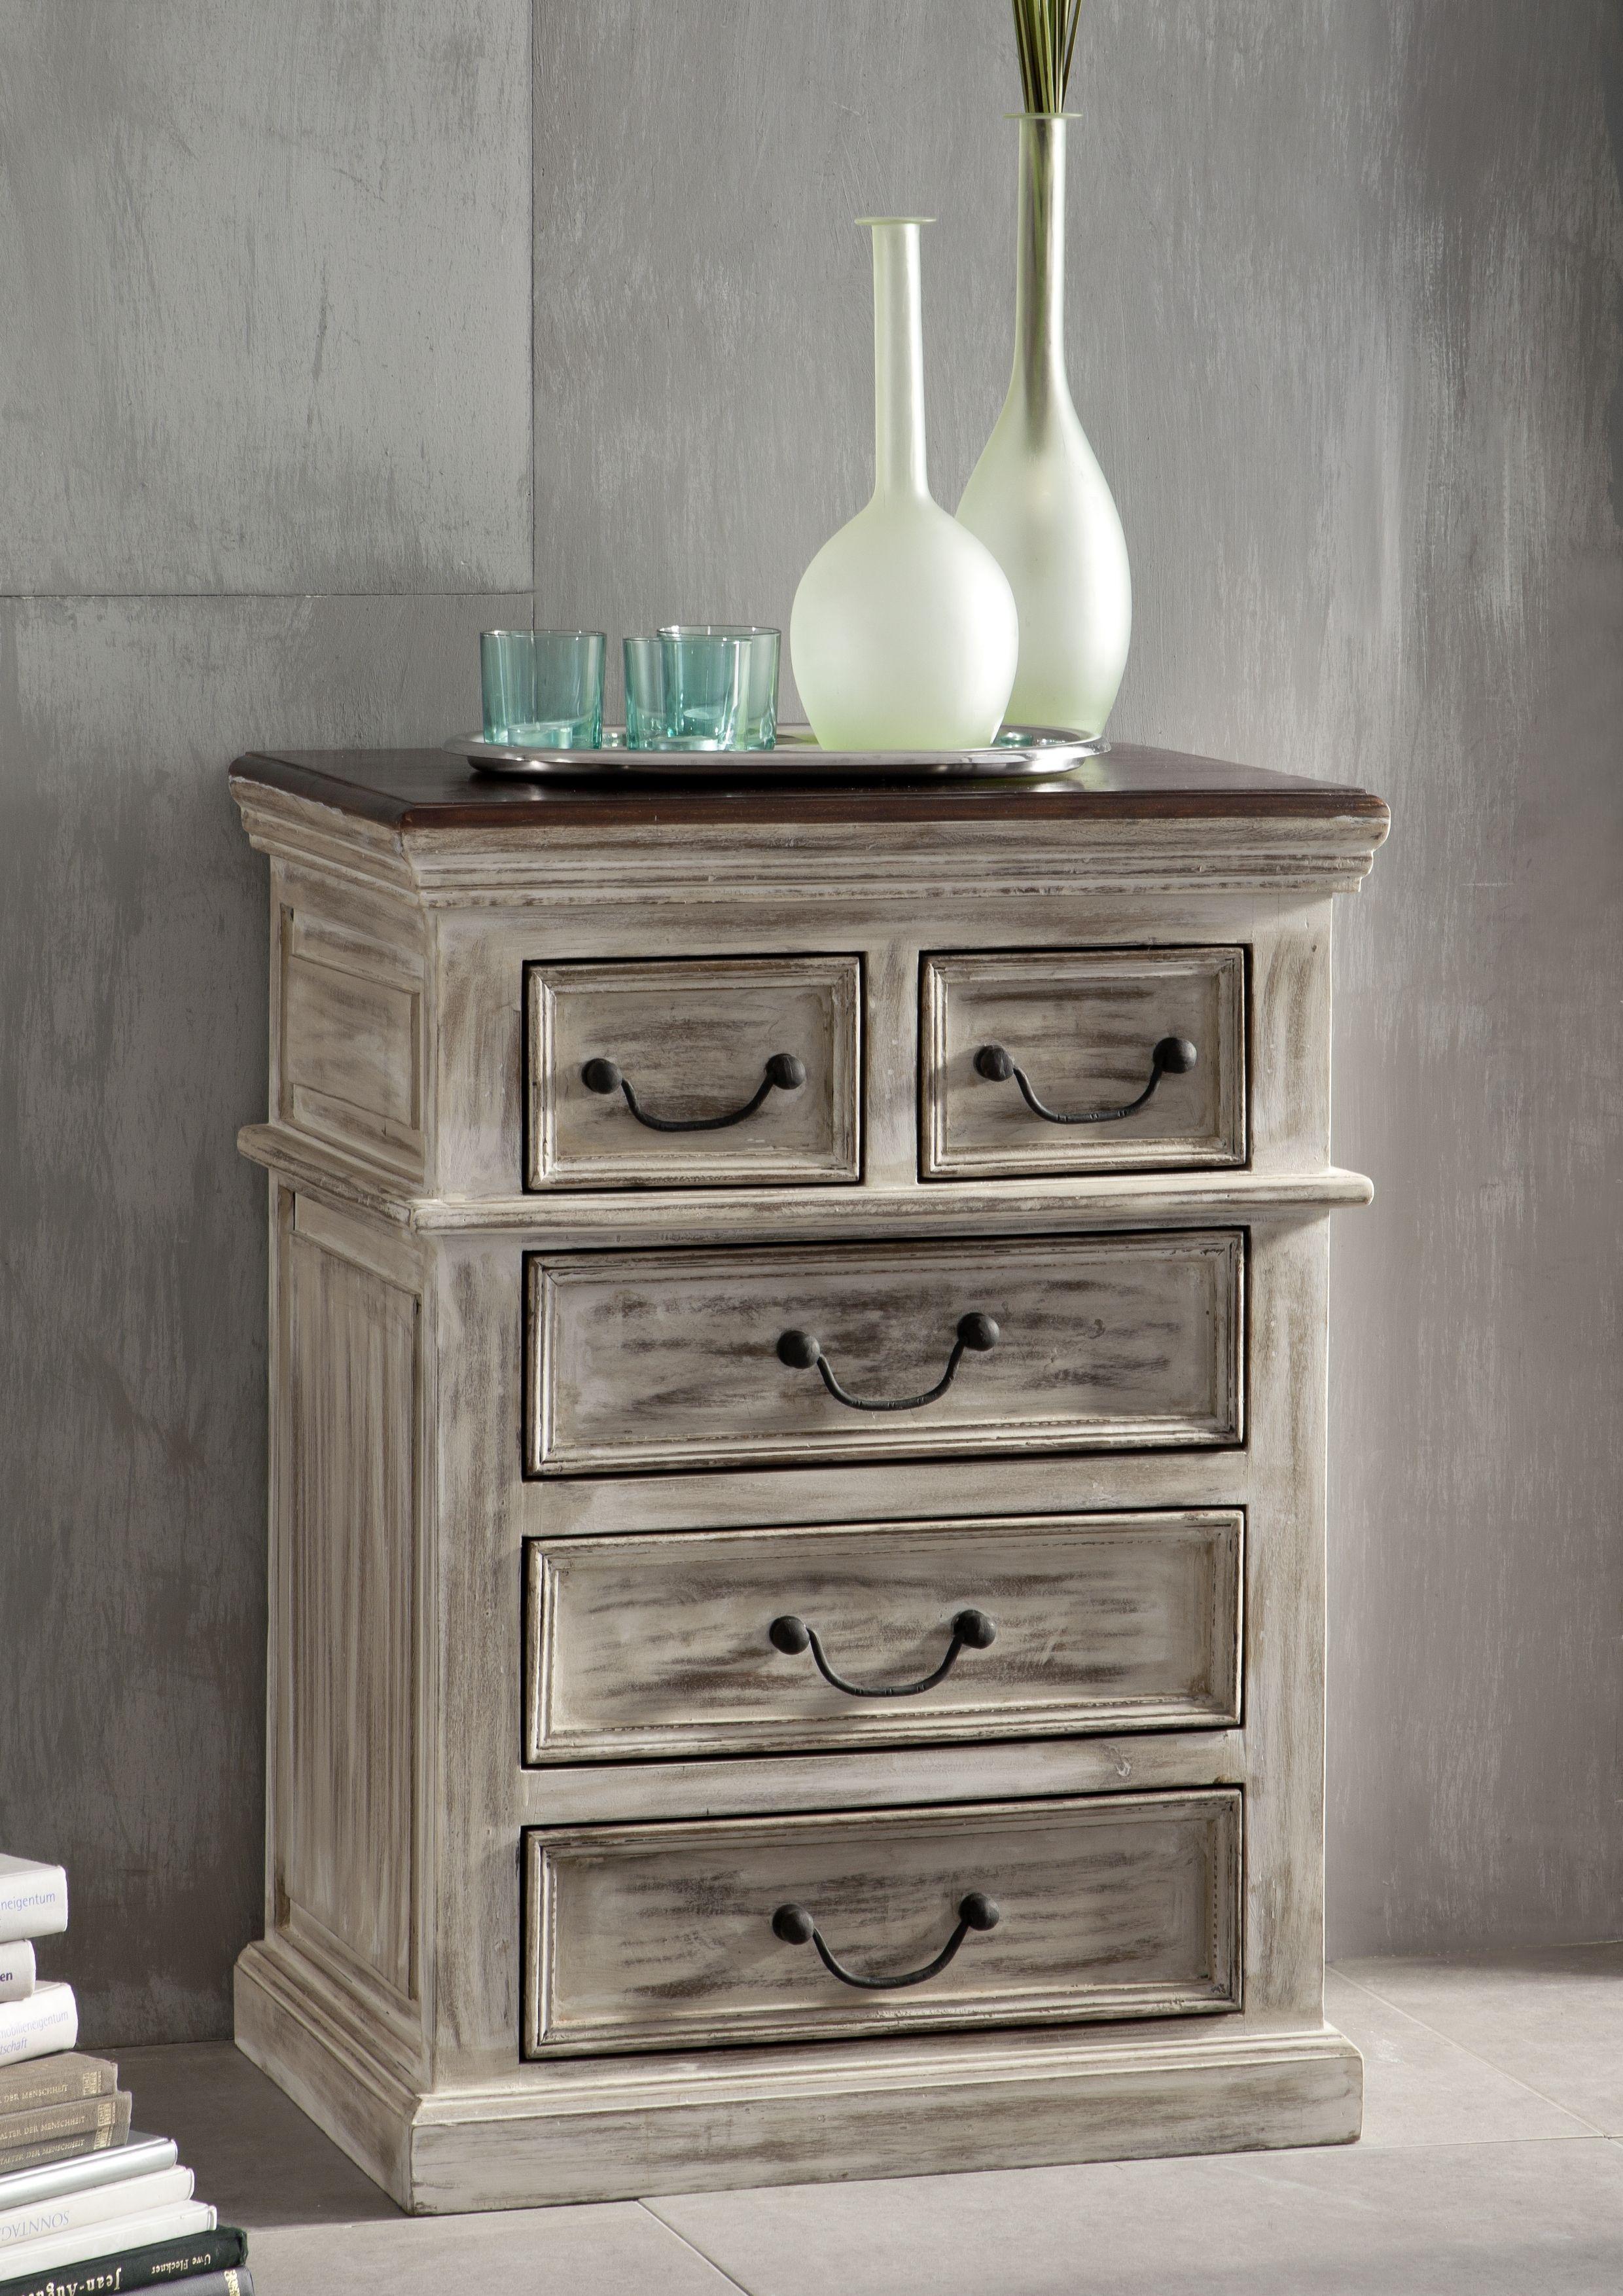 Antike Mobel Versandfrei Kaufen With Images Dresser As Nightstand Furniture Home Decor